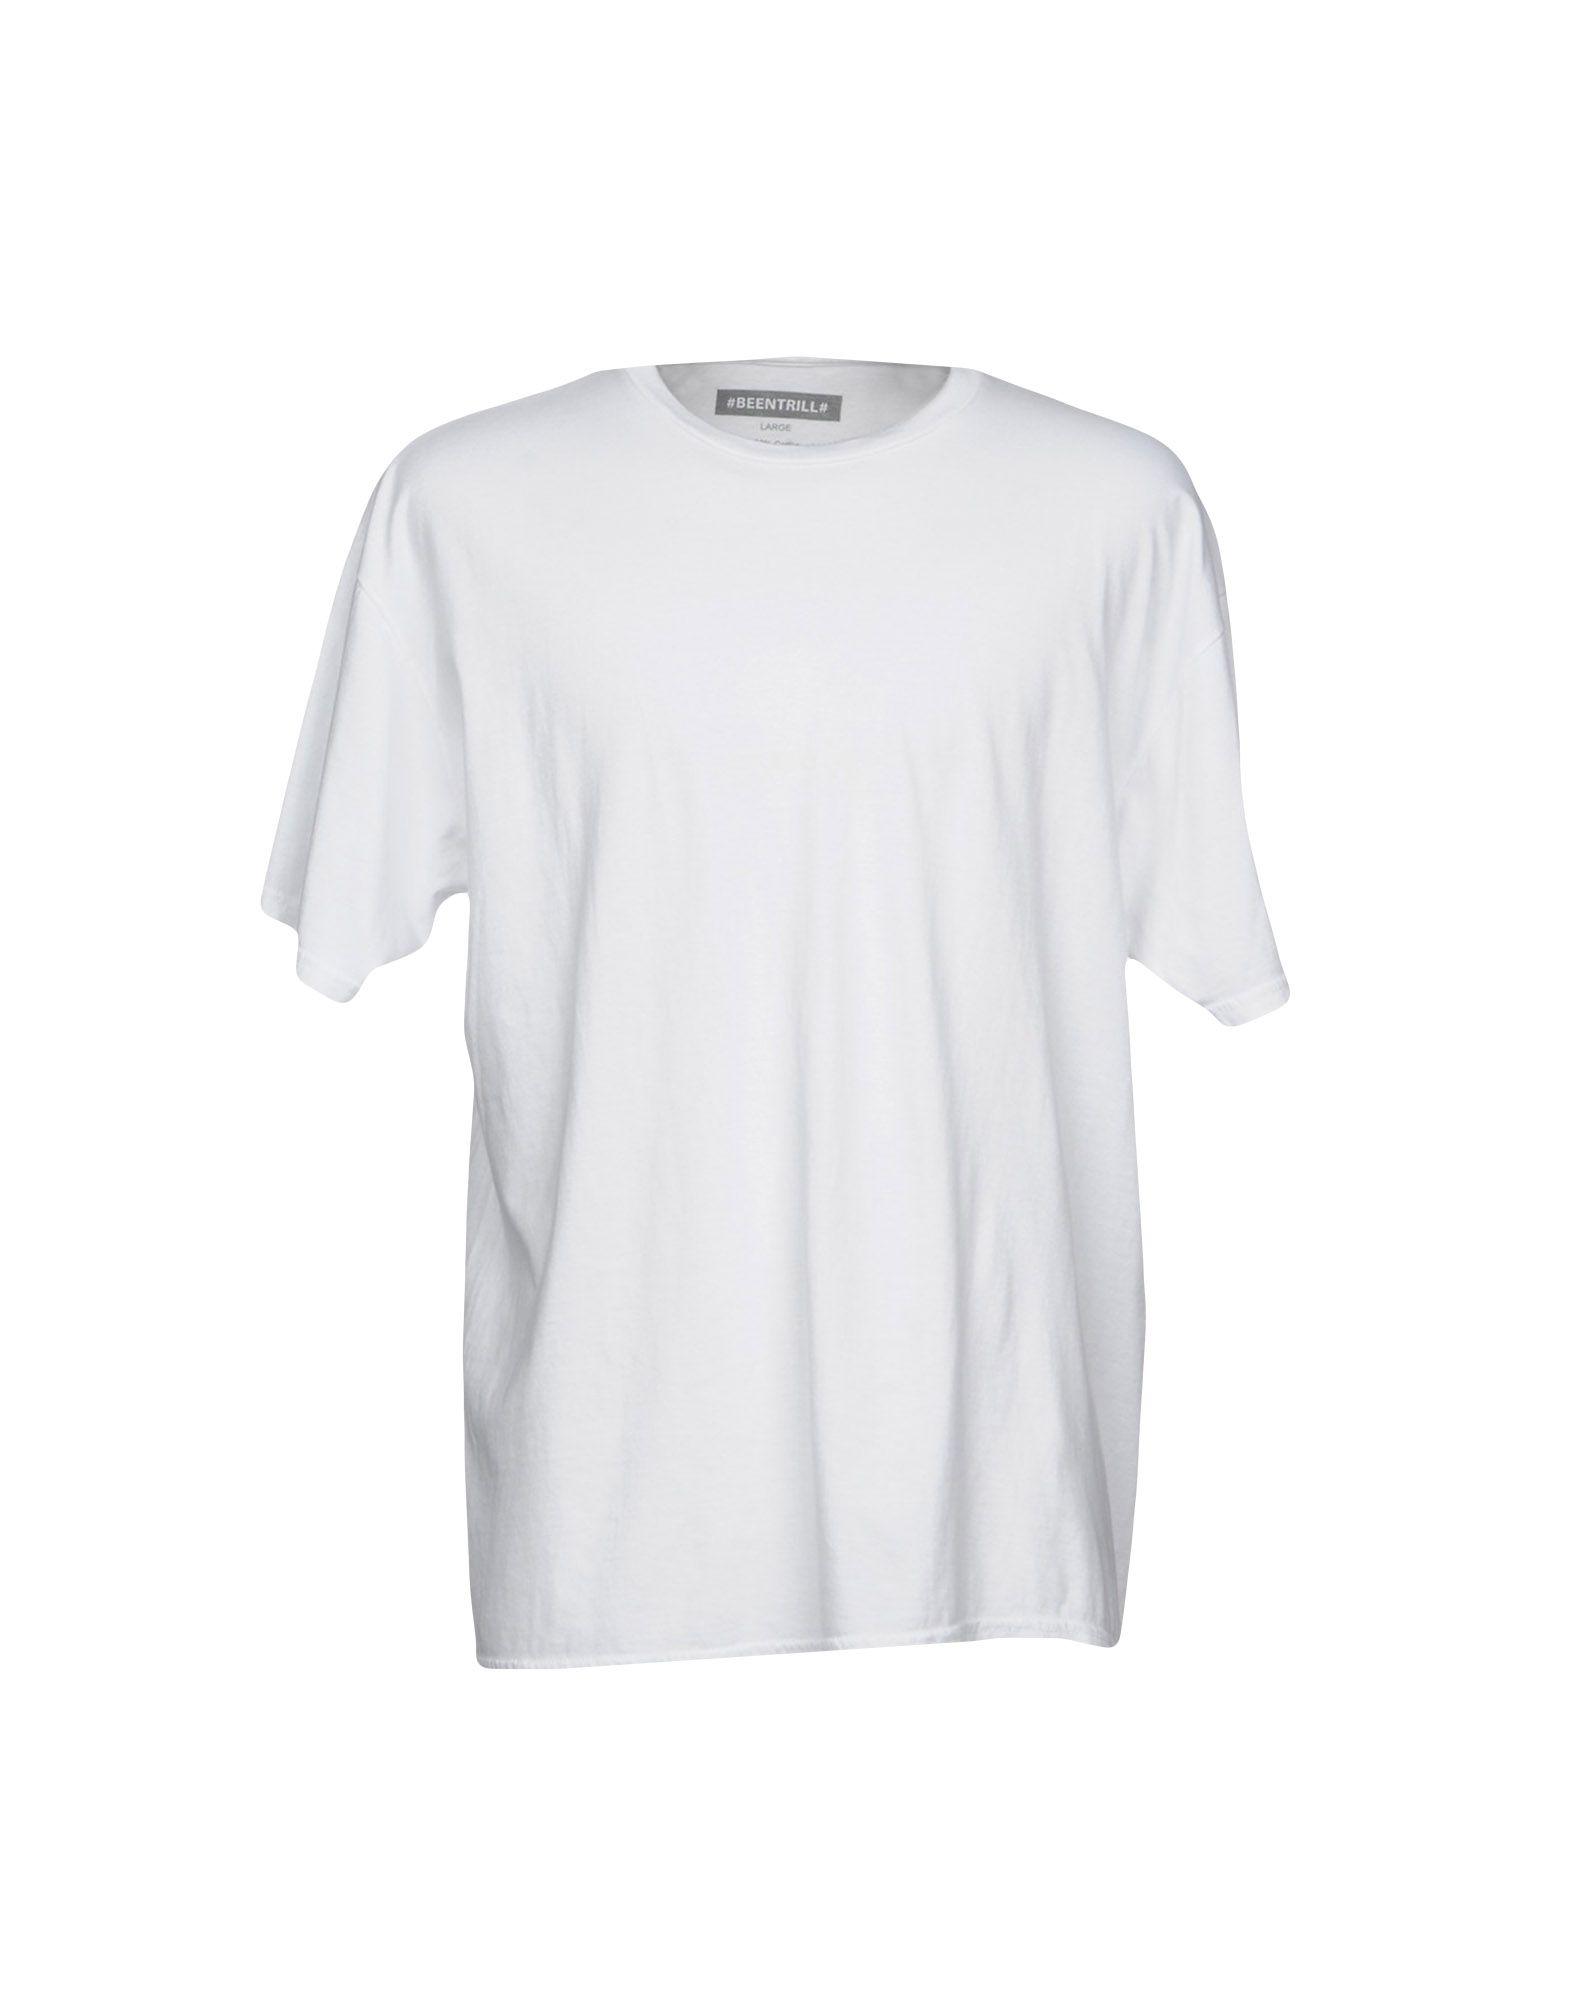 Фото - BEENTRILL Футболка beentrill футболка